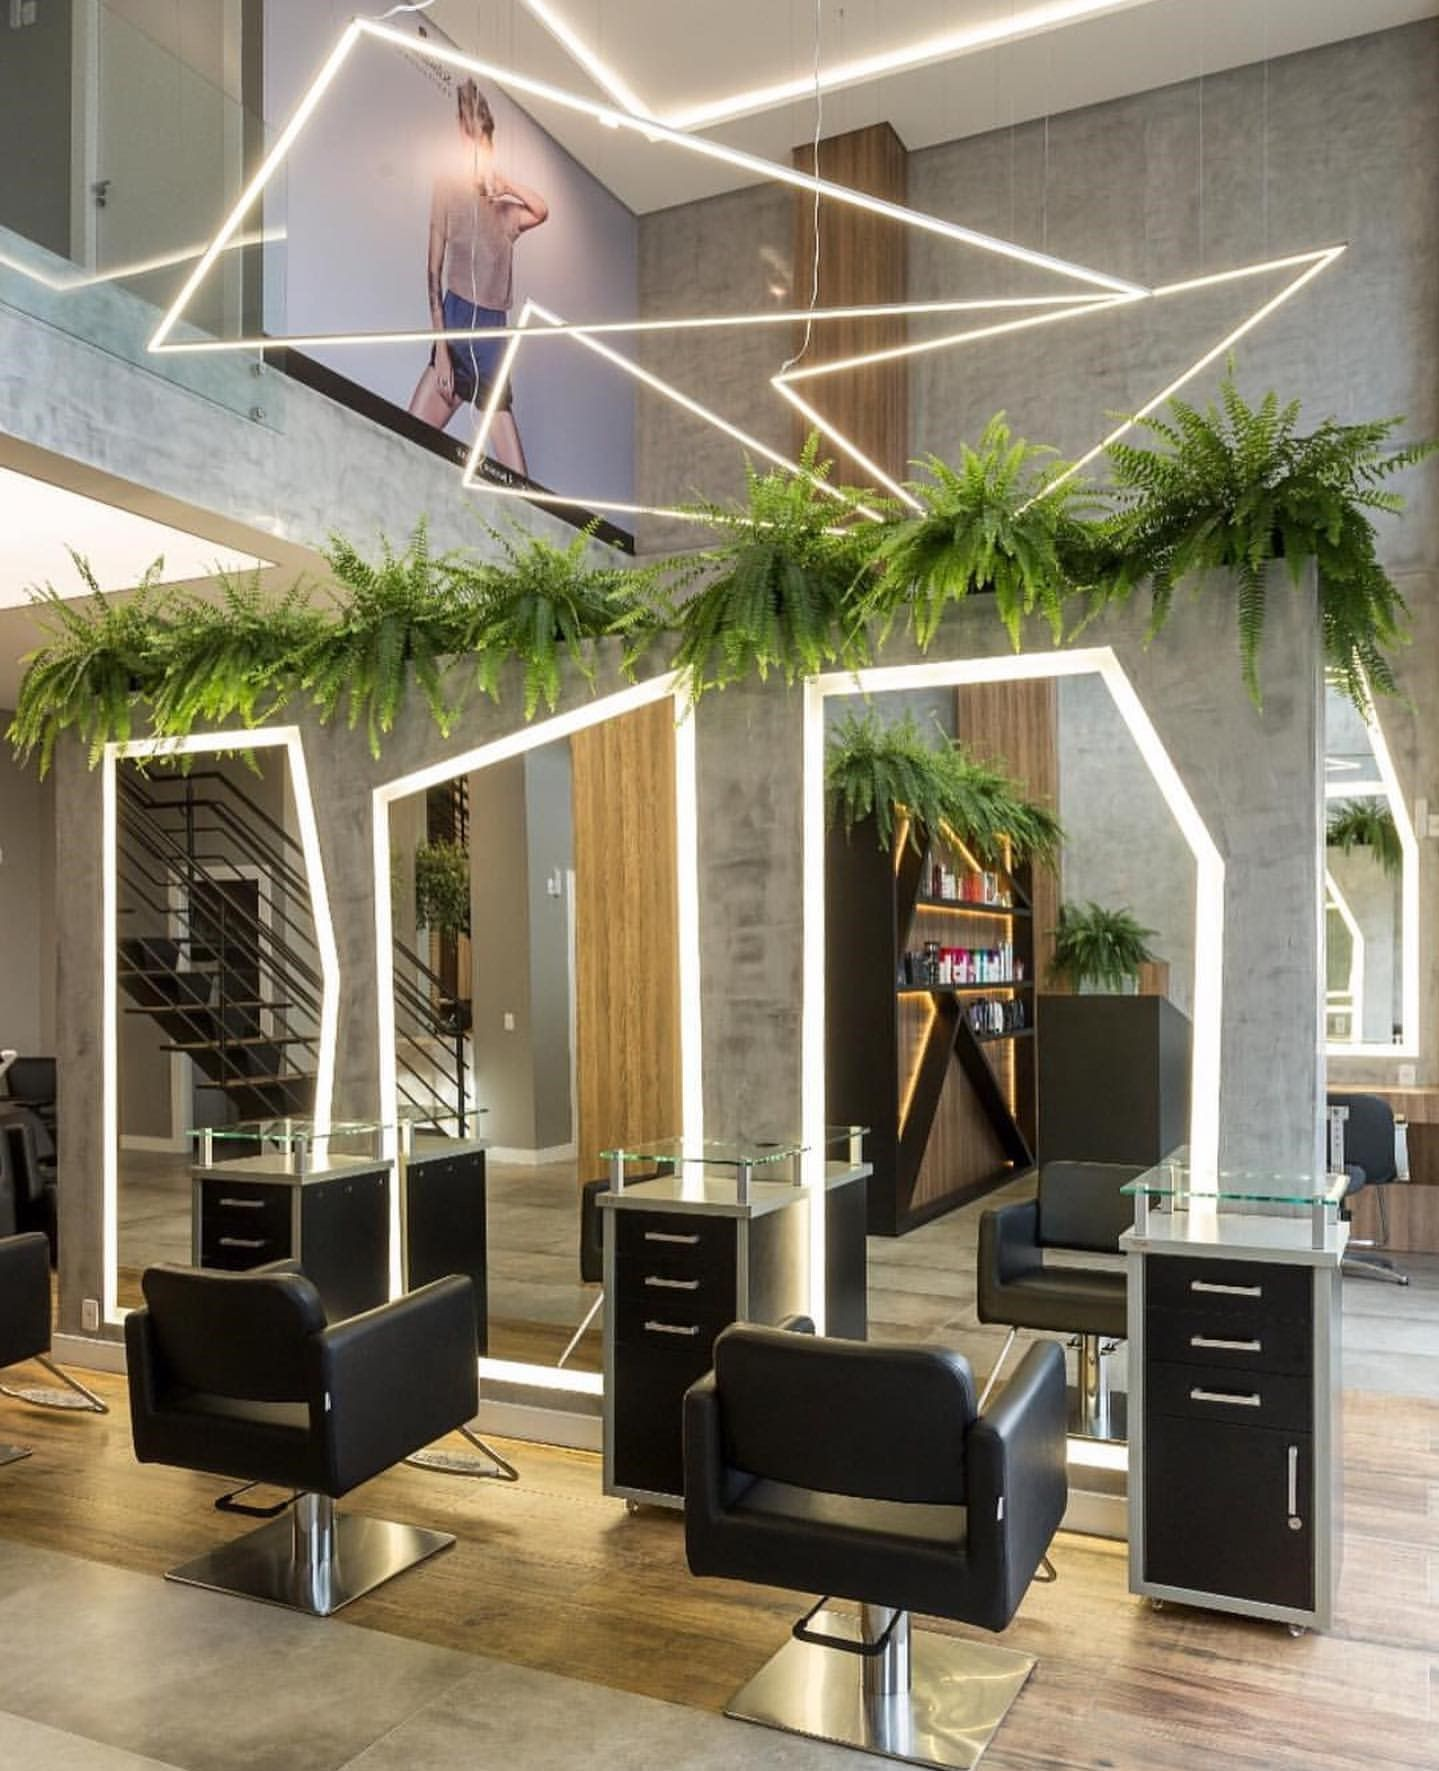 Tanning Salon Interior Design Hair Salon Interior Design Pinterest Spa And Beauty Salon Inte In 2020 Salon Interior Design Salon Interior Nail Salon Interior Design